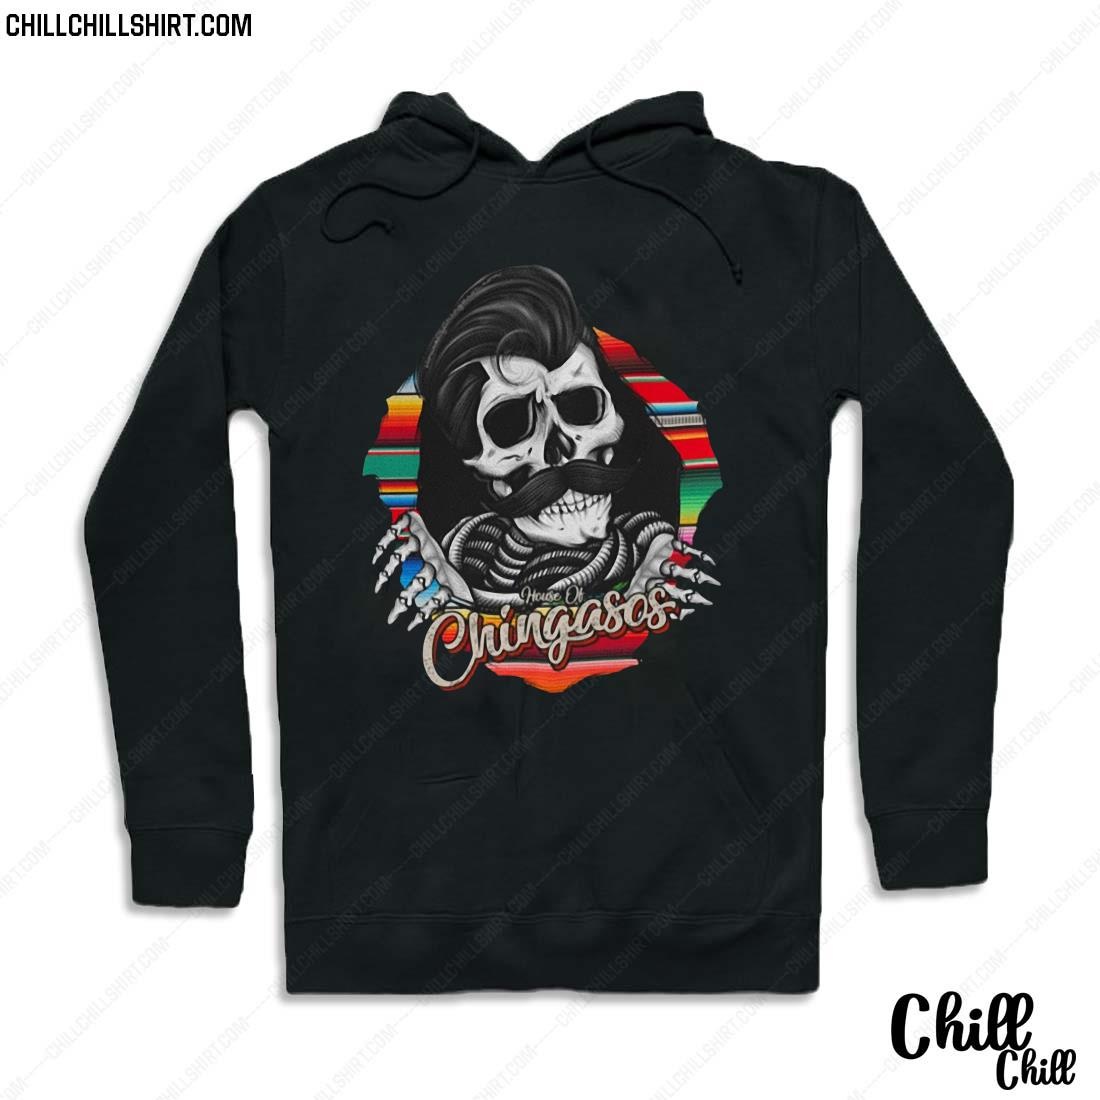 Chingasos Raza Pride Og Tee Shirt Hoodie